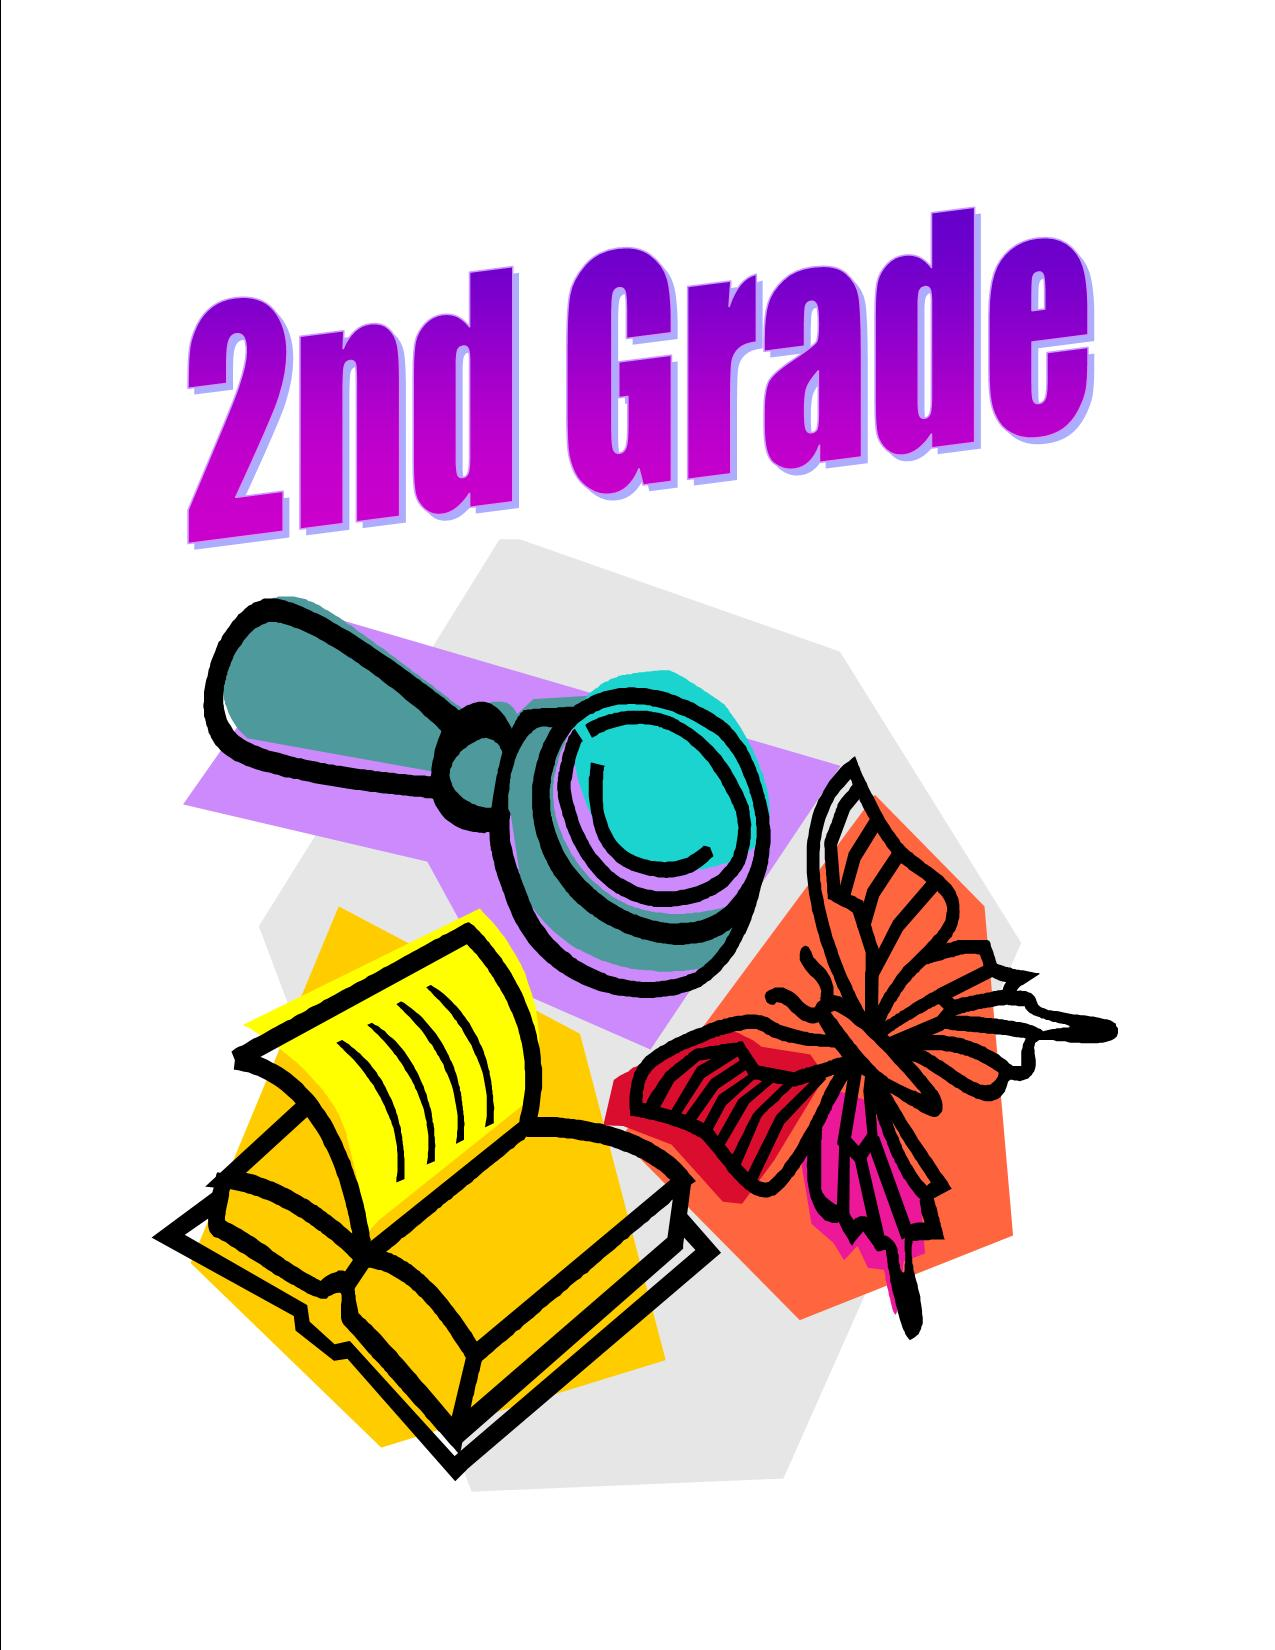 worksheet 2nd Grade school information supply list 2nd grade icon